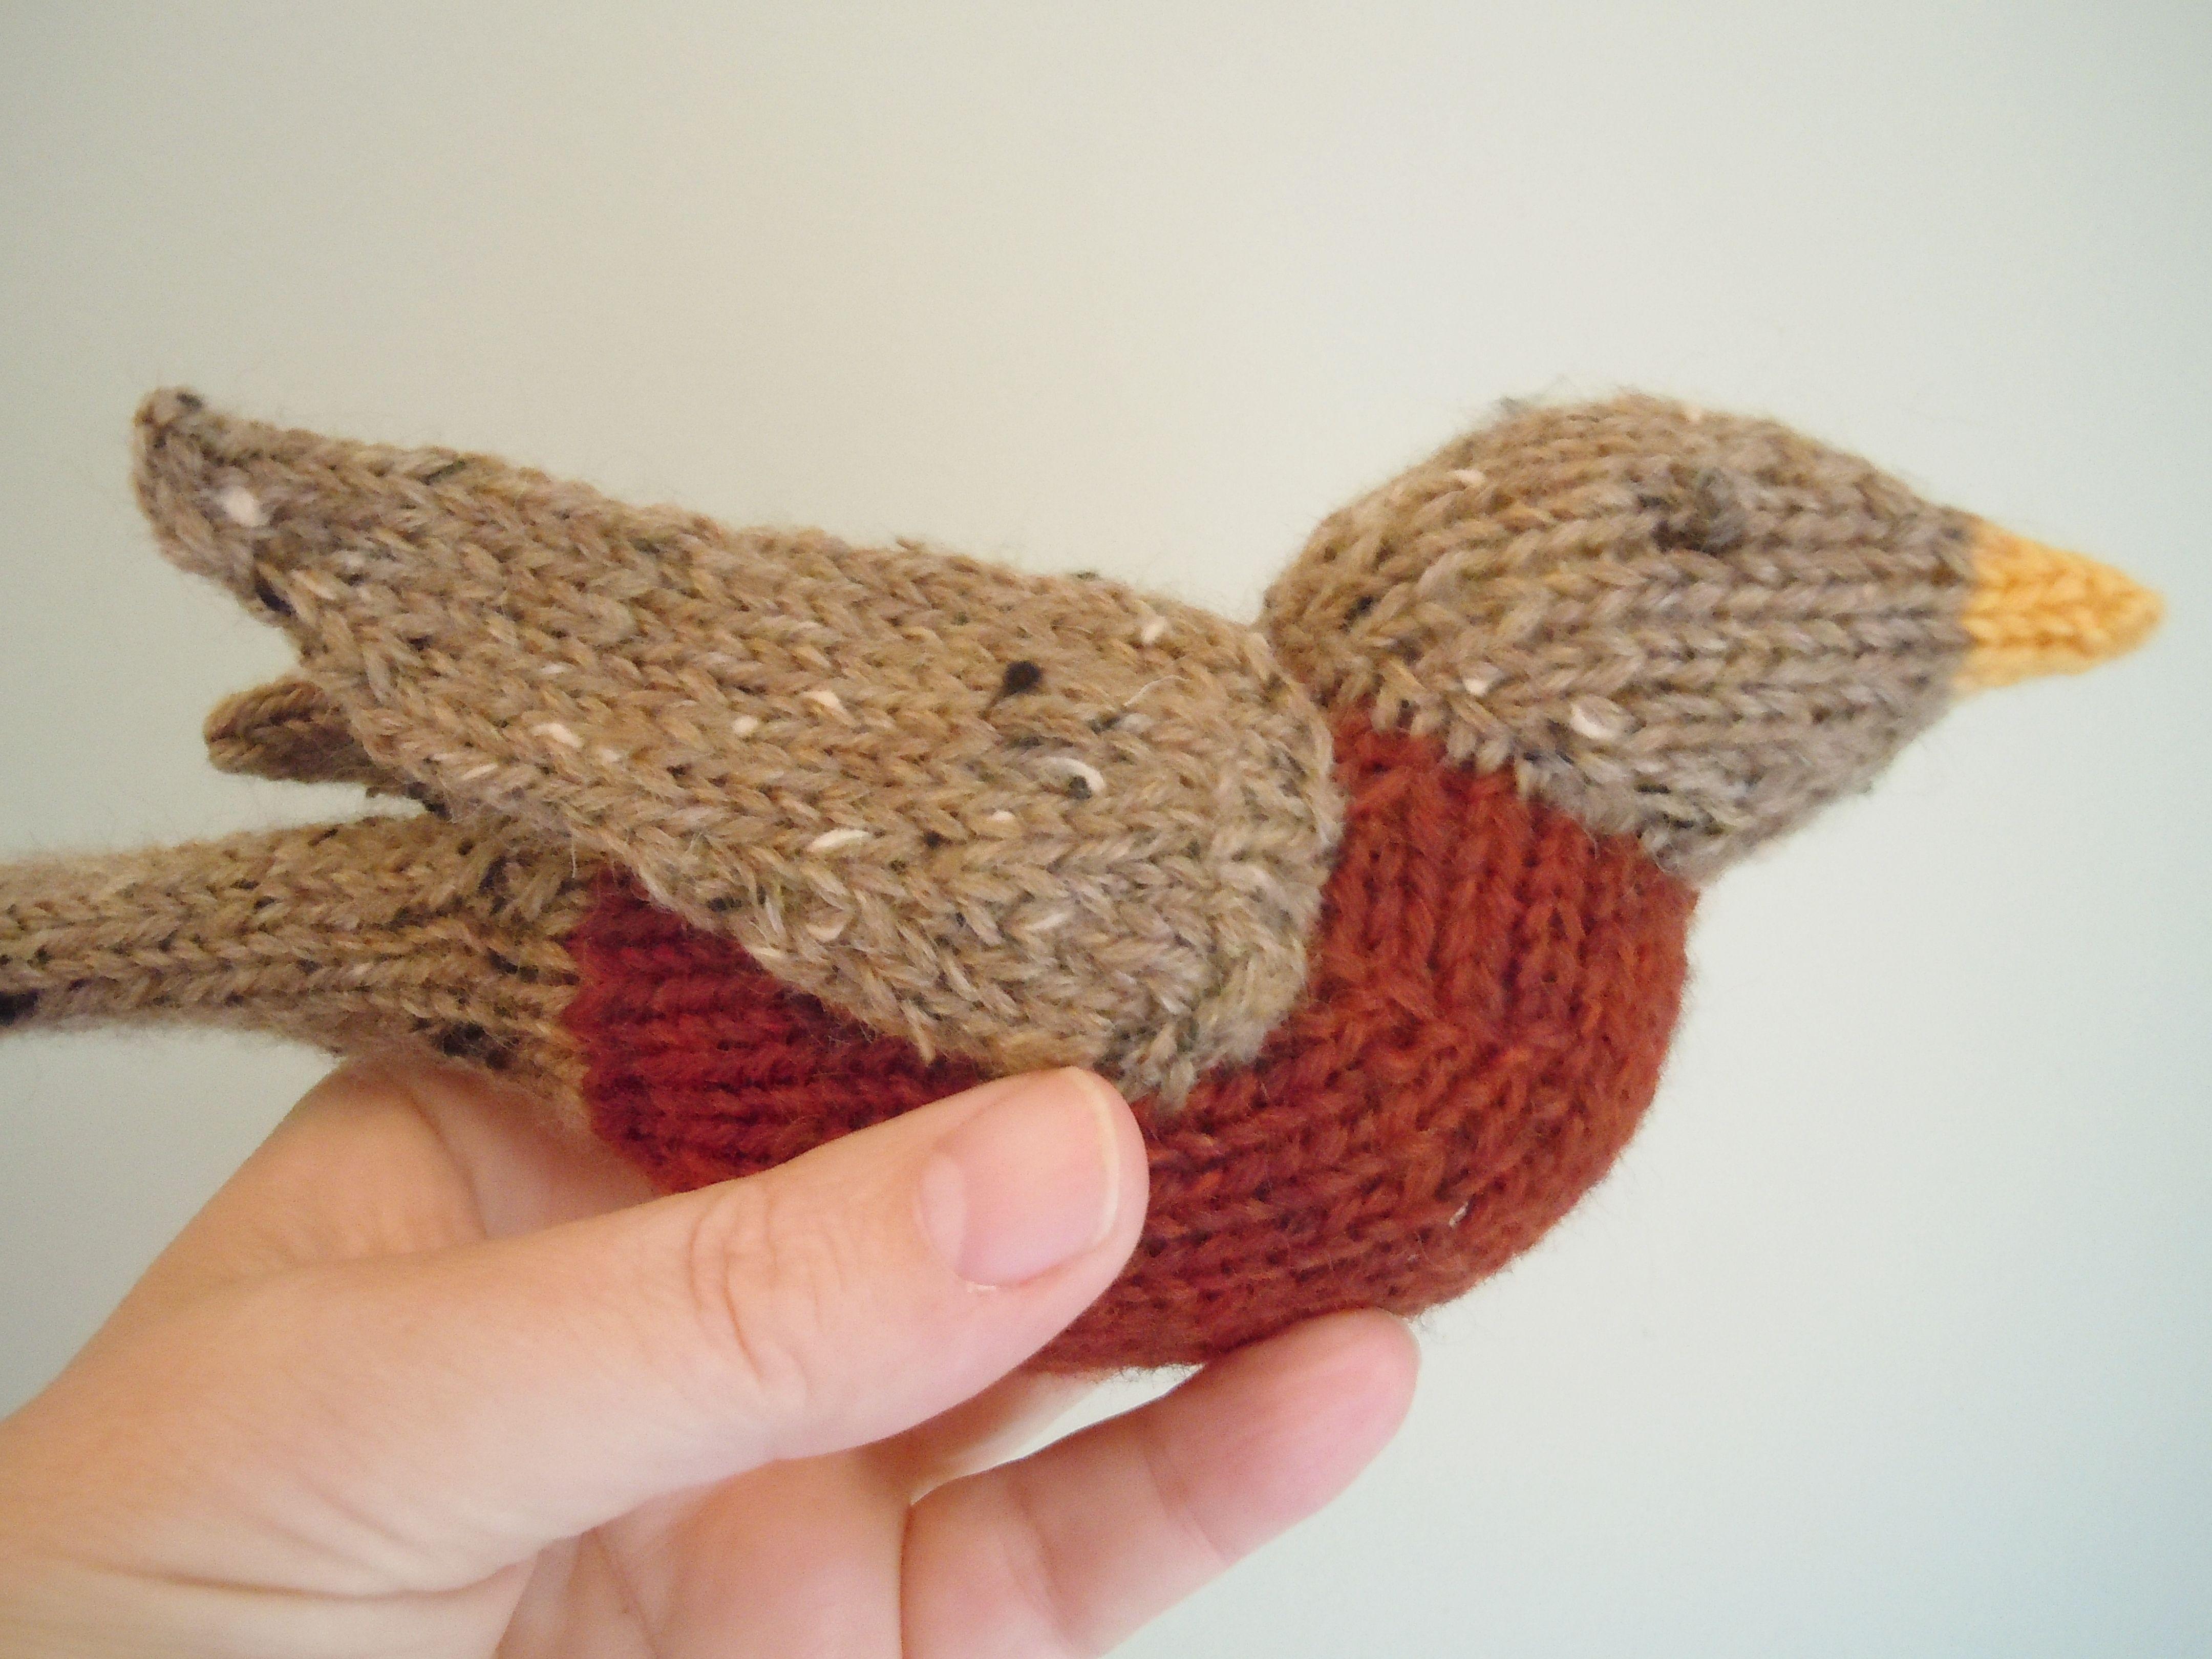 Spring Robin Pattern - Knitting Patterns and Crochet Patterns from KnitPicks.com